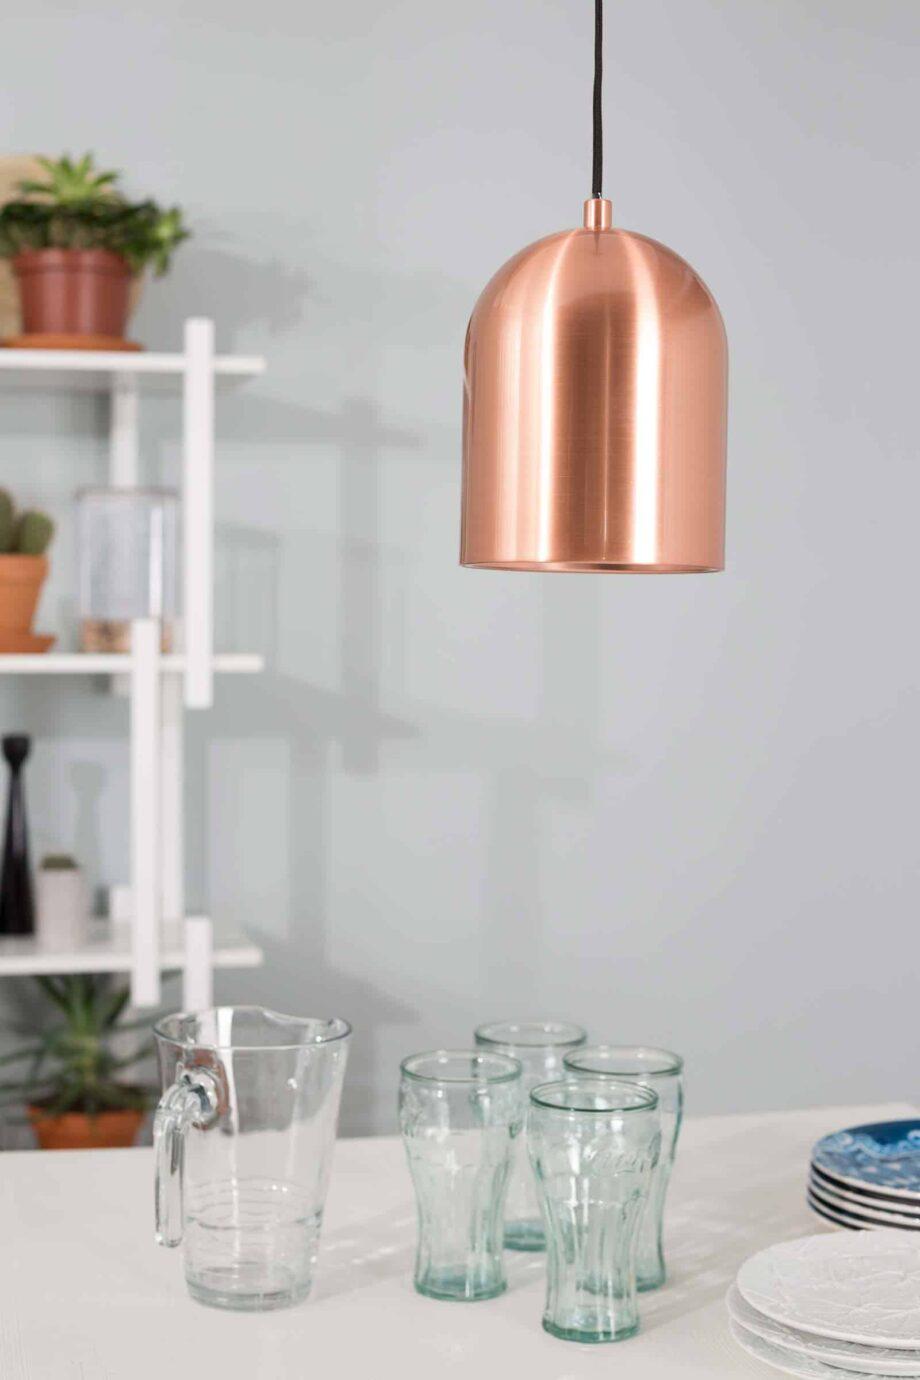 Marvel hanglamp Zuiver koper